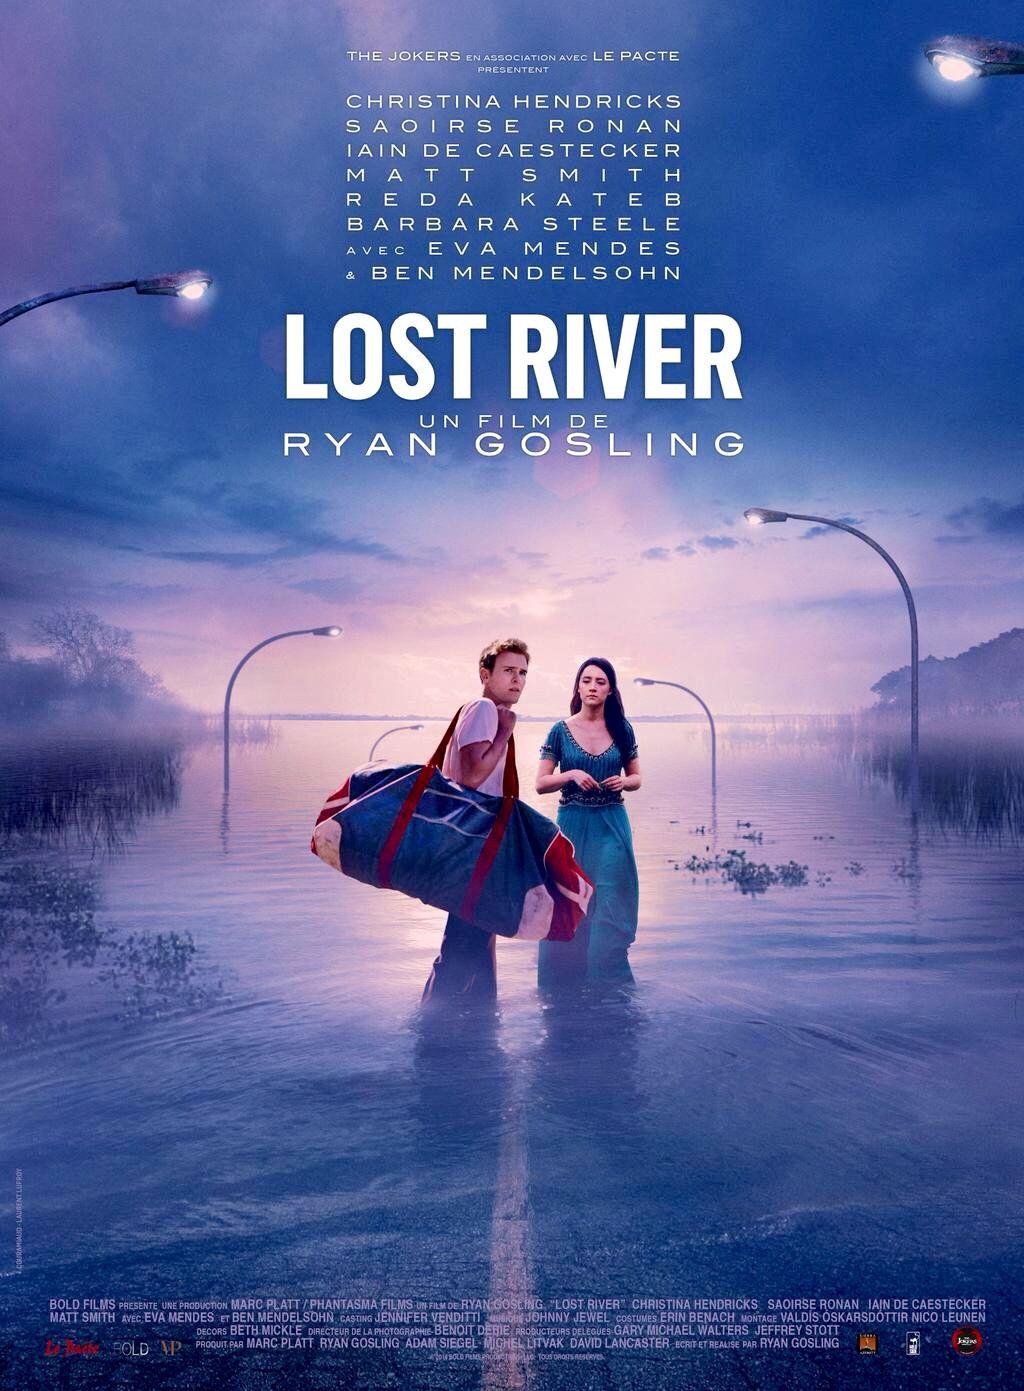 LOST RIVER de RYAN GOSLING sort ce Mercredi en France